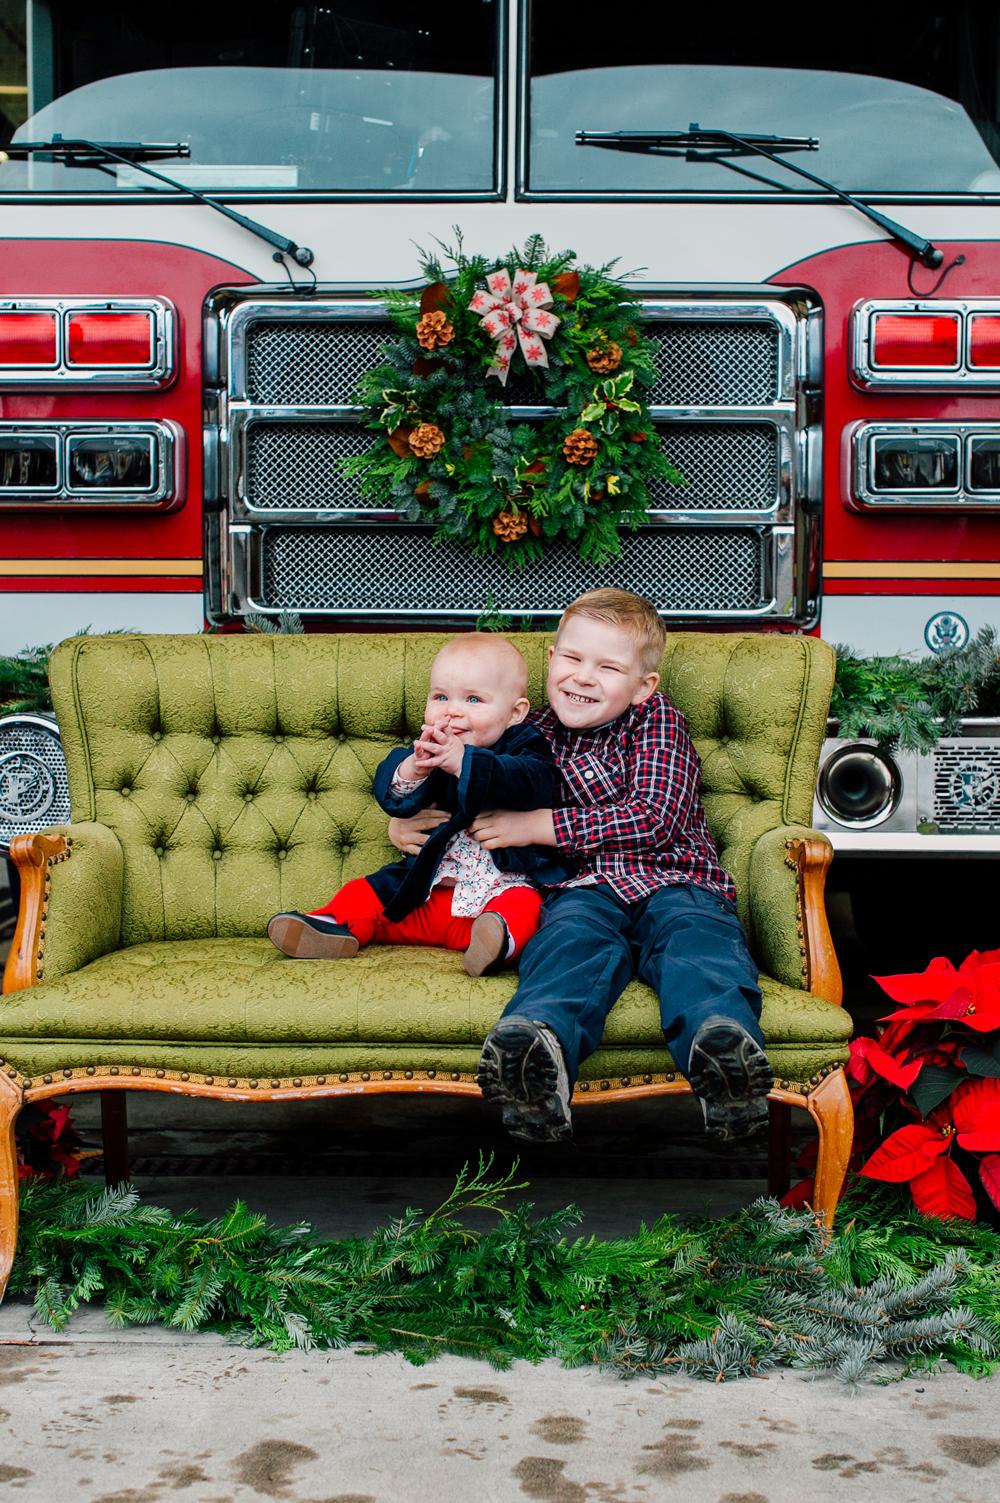 003-bellingham-photographer-katheryn-moran-fundraiser-help-for-holidays-2018.jpg